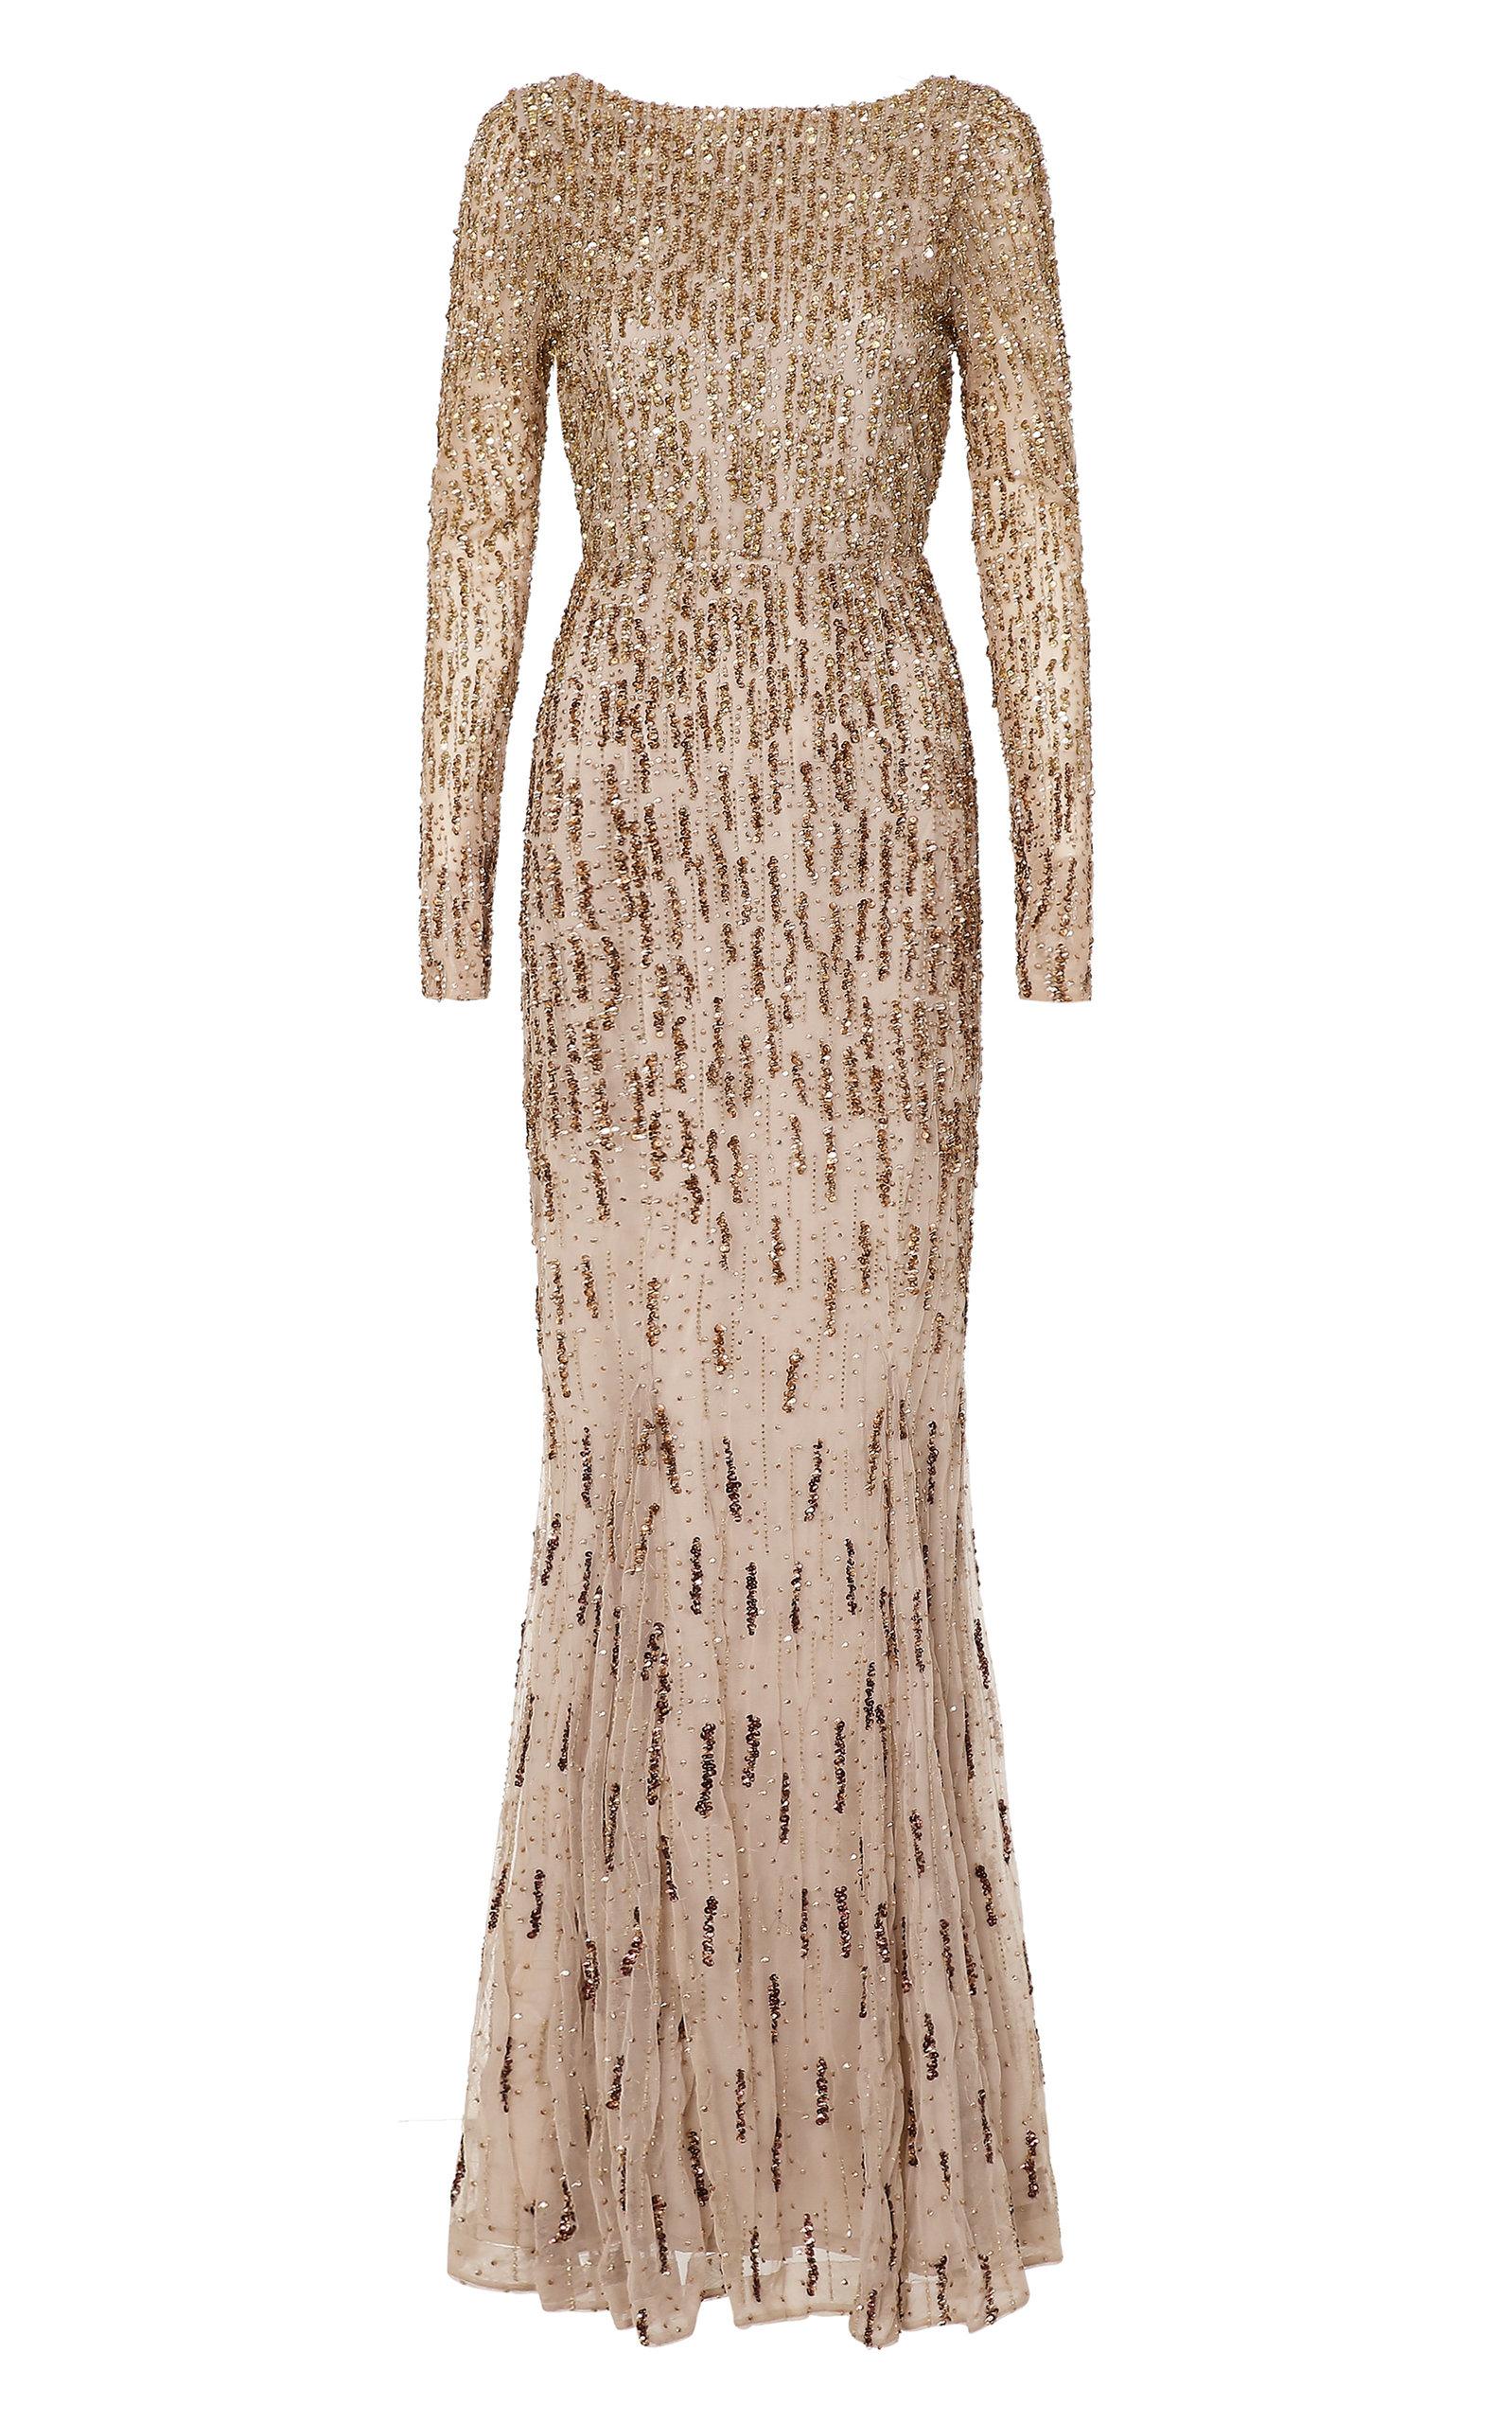 5c58ce64488 Rachel GilbertAmabel Embellished Gown. CLOSE. Loading